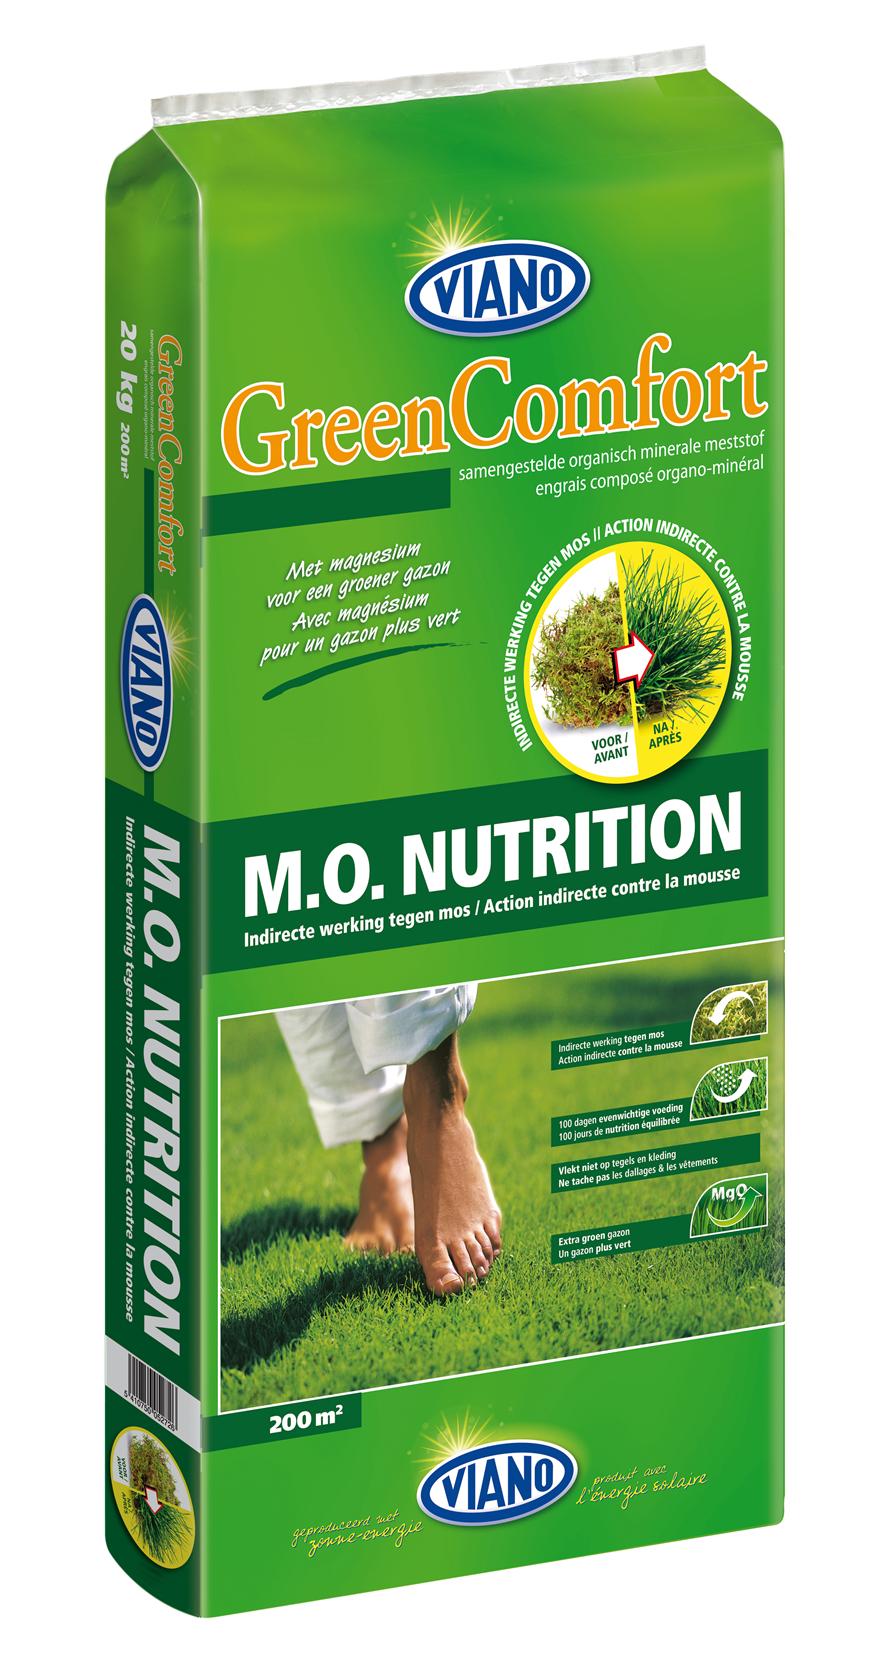 Nutrition-MO-Gazonmeststof-20kg-Indirecte-werking-tegen-Mos